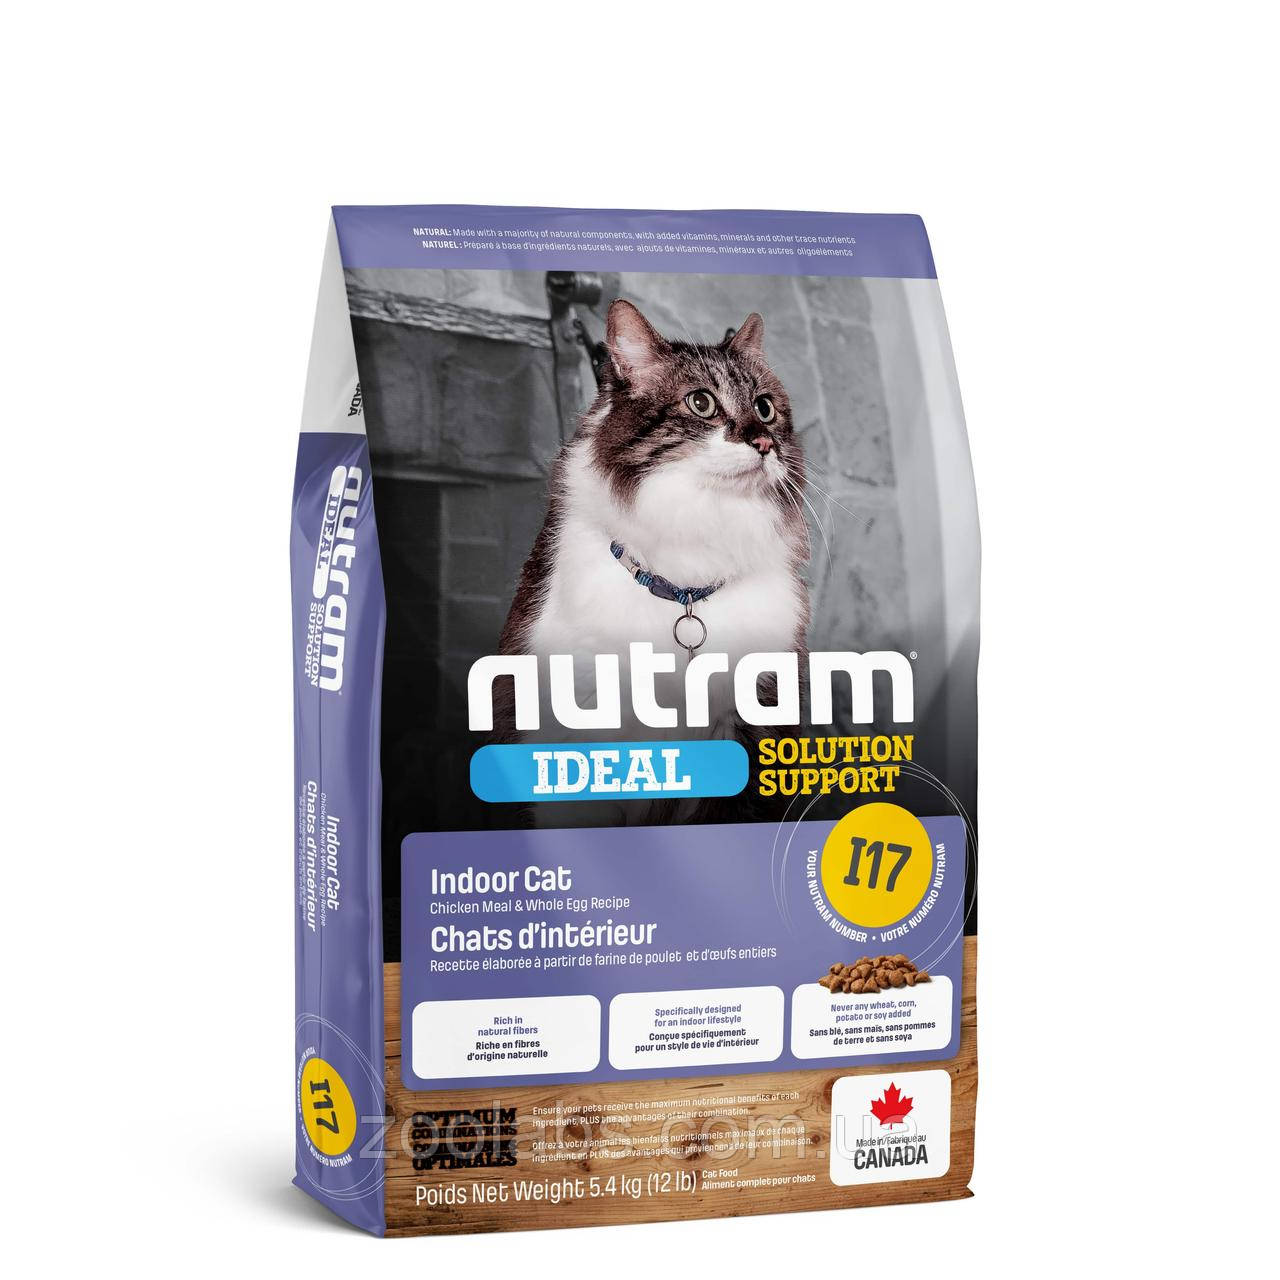 Корм Nutram для взрослых кошек   Nutram I17 Ideal Solution Support Finicky Indoor Cat Food 5.4 кг